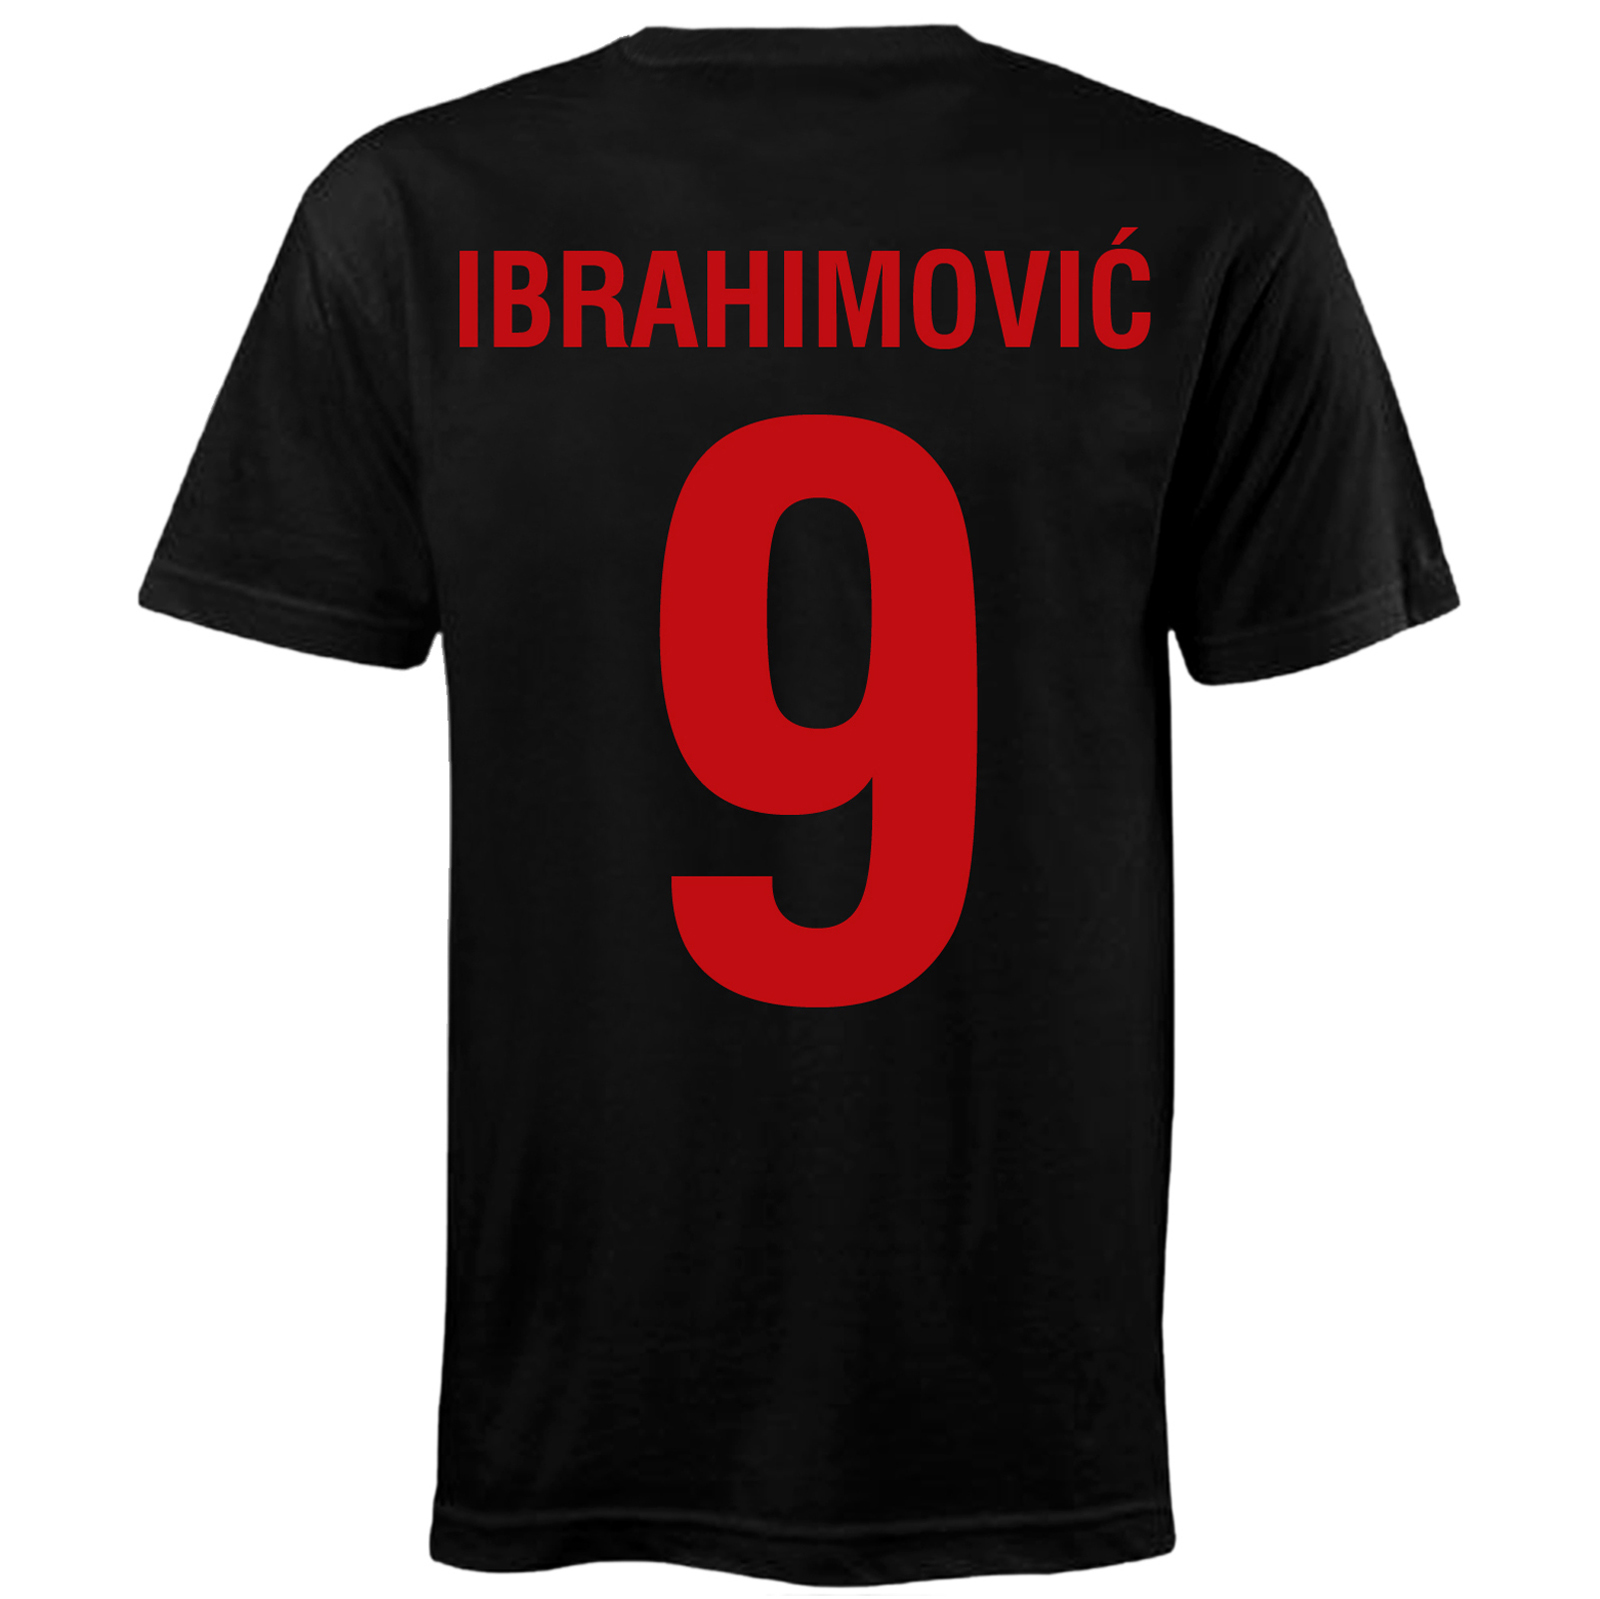 superstar football player in manchester united kit t shirt ebay. Black Bedroom Furniture Sets. Home Design Ideas